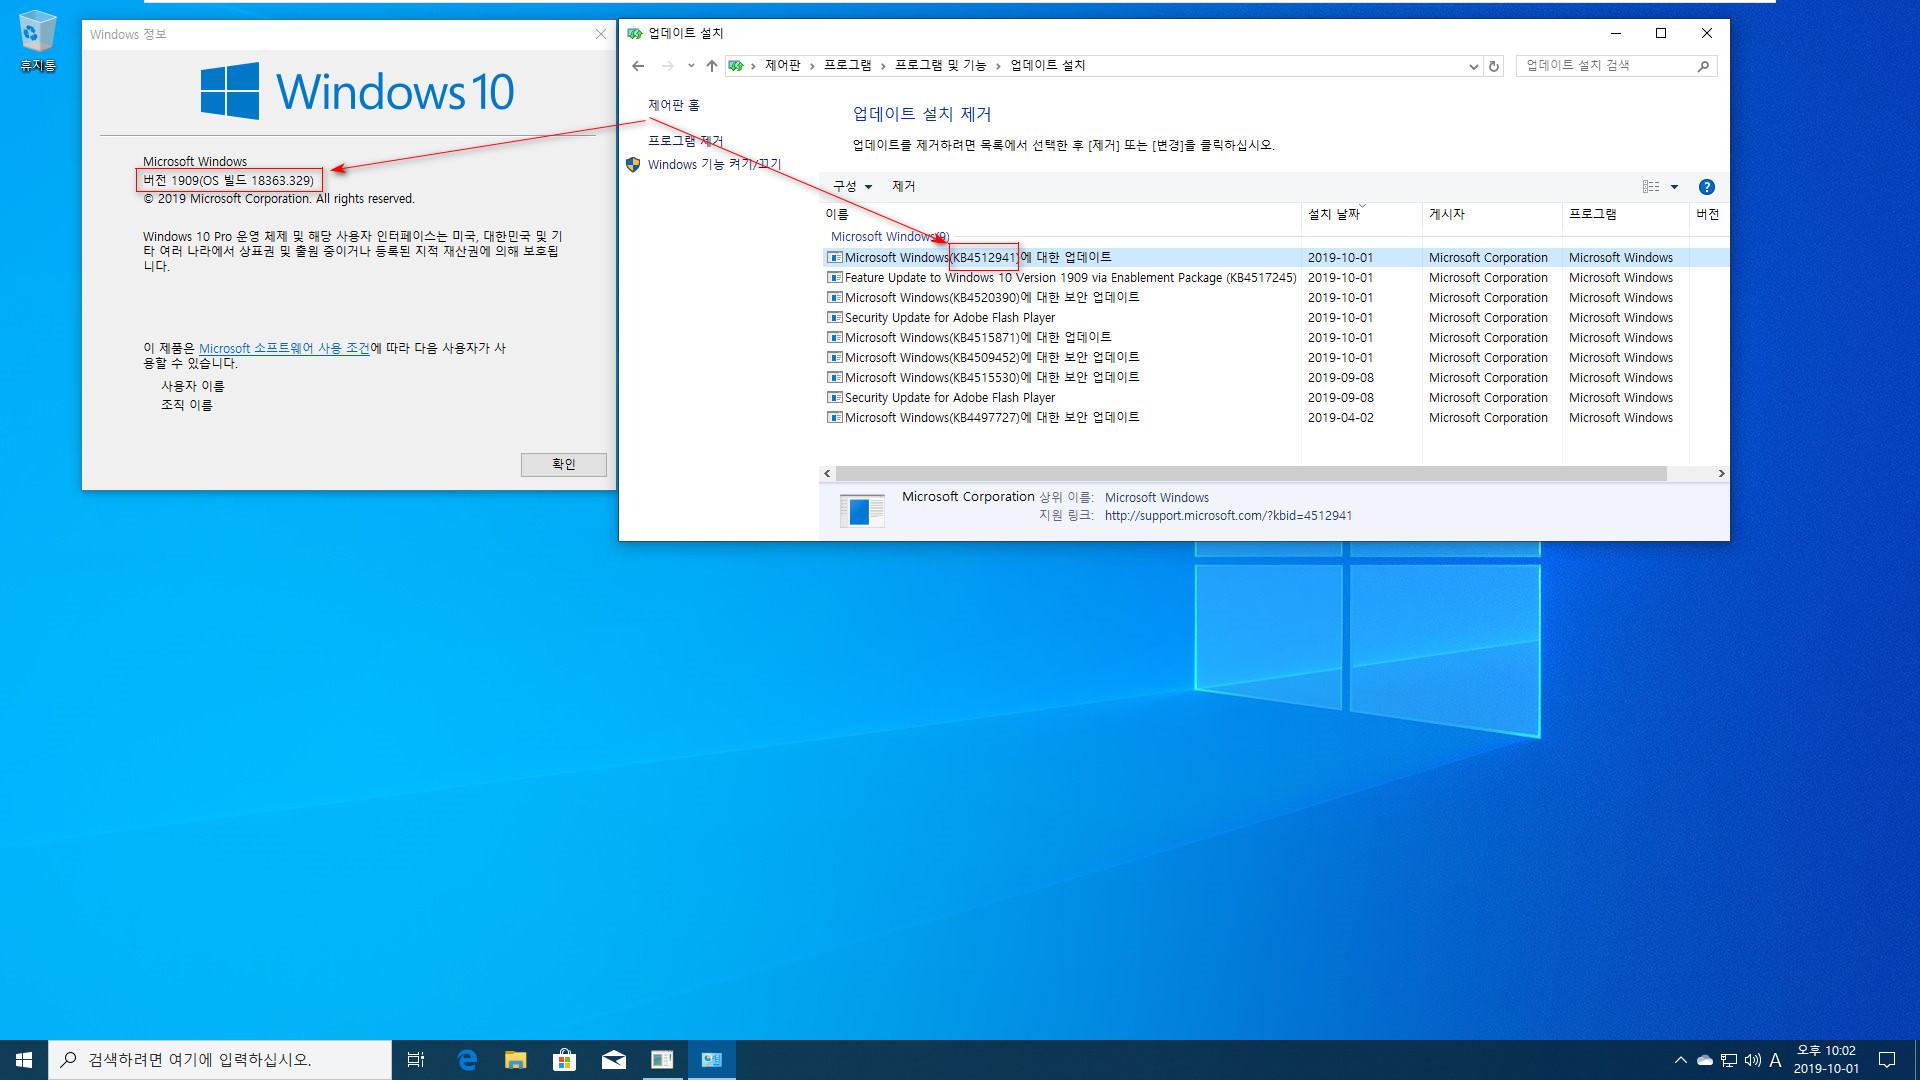 Windows 10 버전 1903 (OS빌드 18362.10022)에서 버전 1909 (OS빌드 18363.387) 으로 변경하기 테스트 - .387 누적 업데이트는 반영이 안 되어서 다시 설치해야겠습니다 2019-10-01_220201.jpg